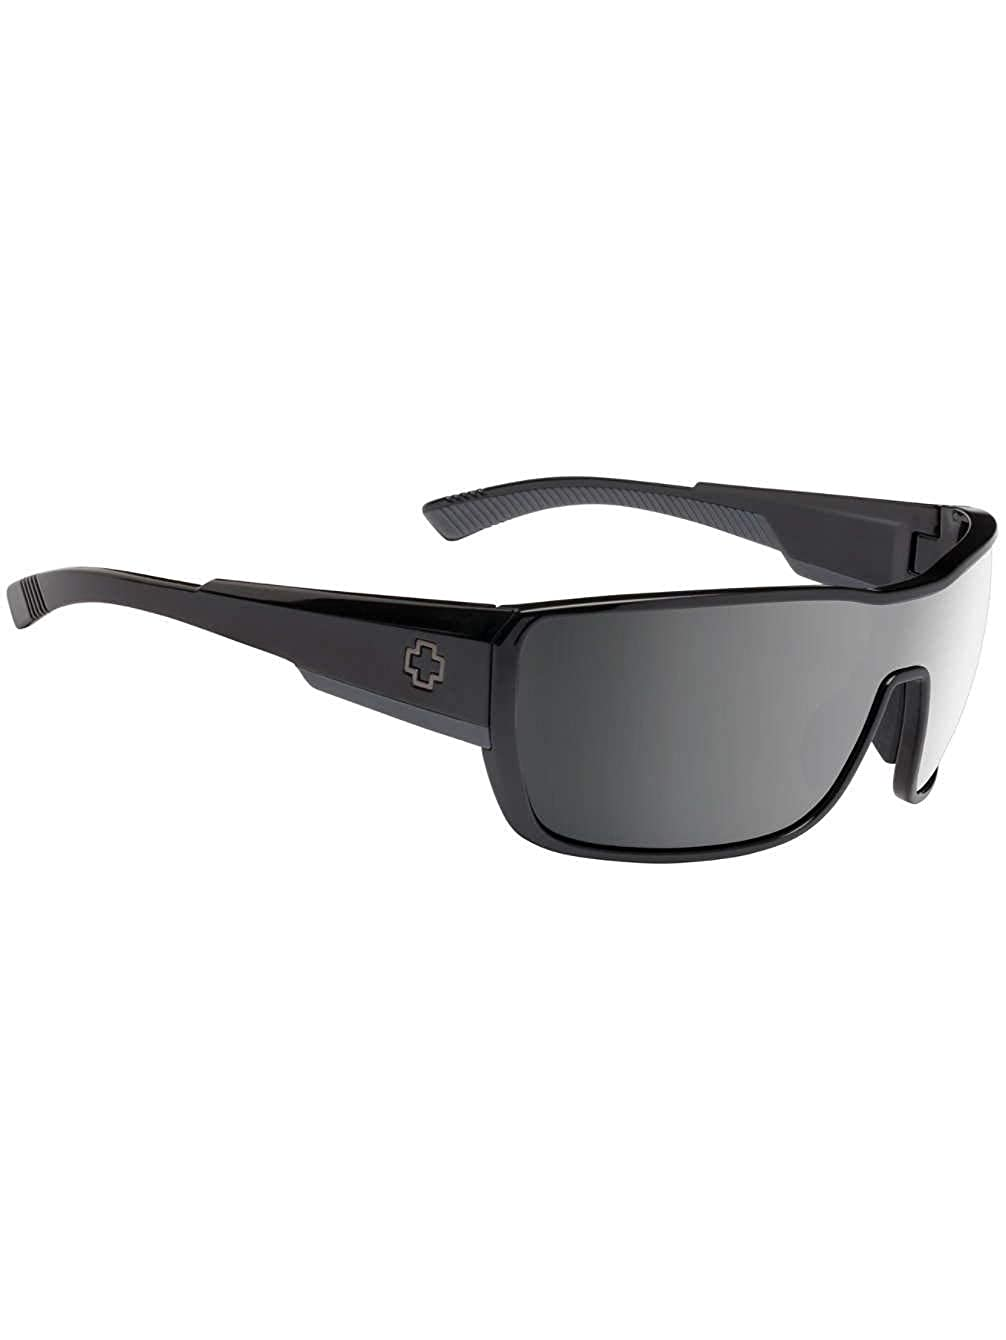 SPY Optic Tron 2 Oversized Sunglasses Polarized Styles Available 673503038832